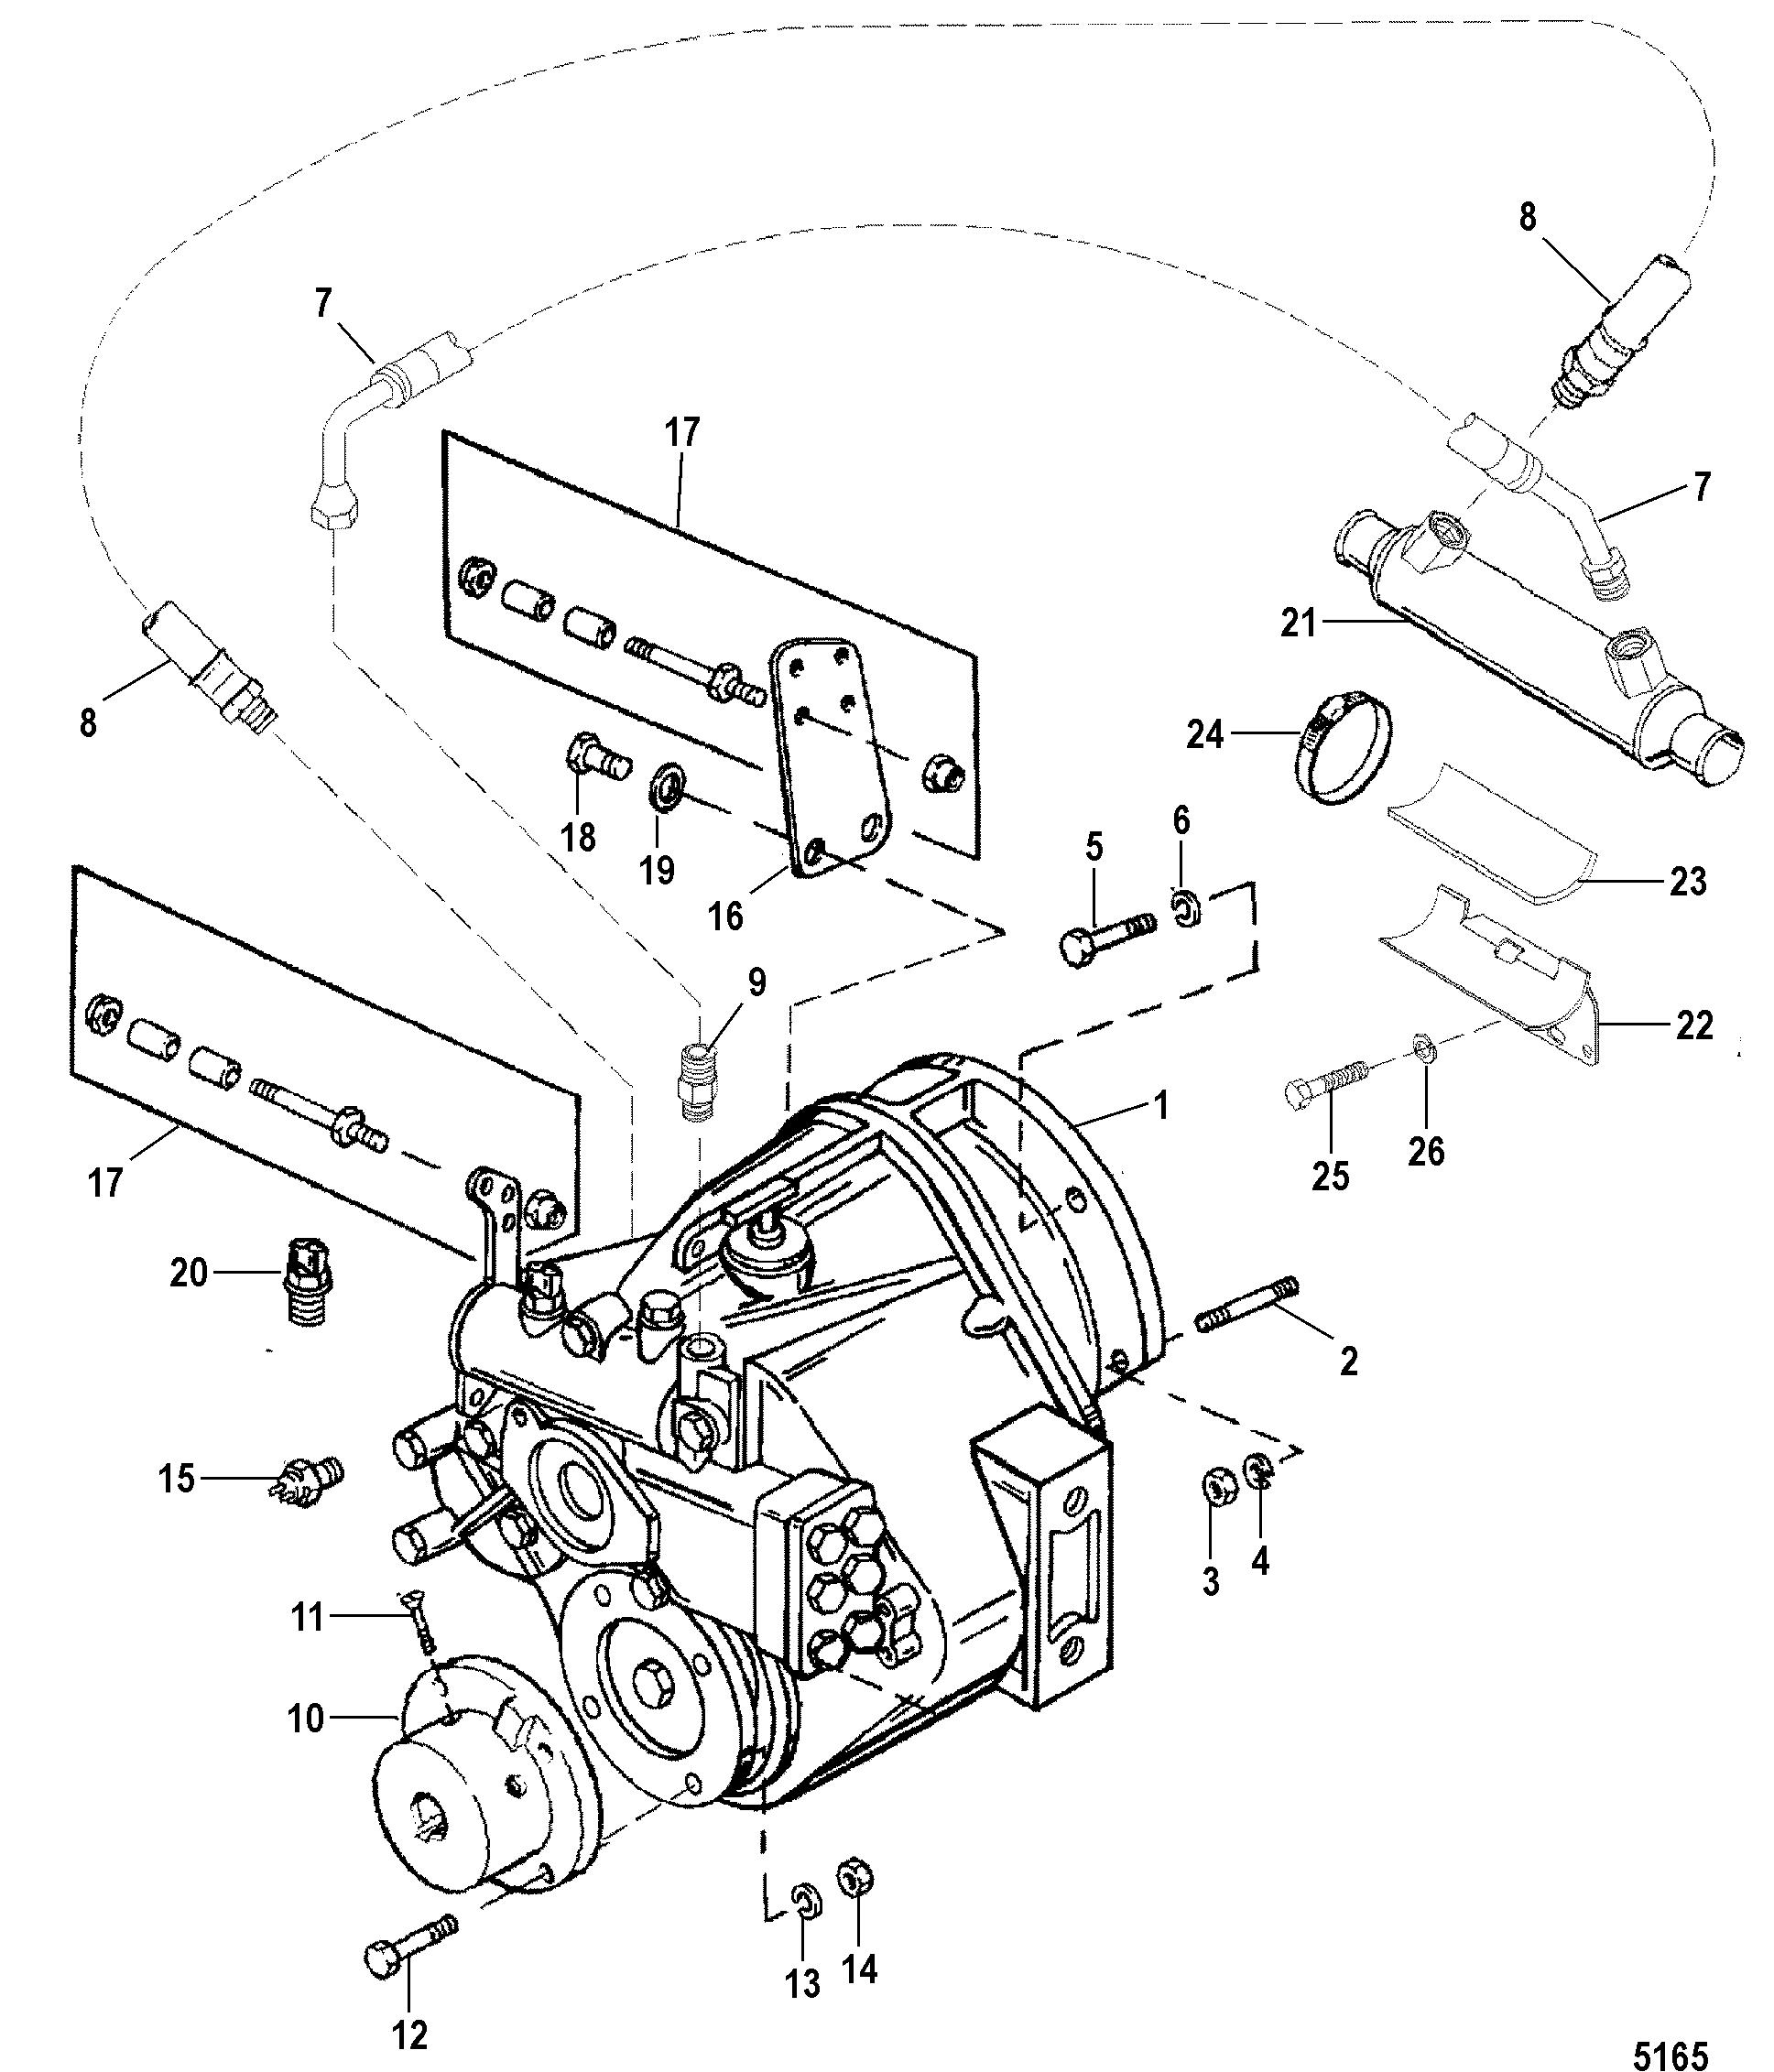 1985 Mercruiser 170 Drive Diagrams Circuit Wiring And Diagram Hub 3 7 Engine Inboard Transmission Database Rh Brandgogo Co 1986 Starter